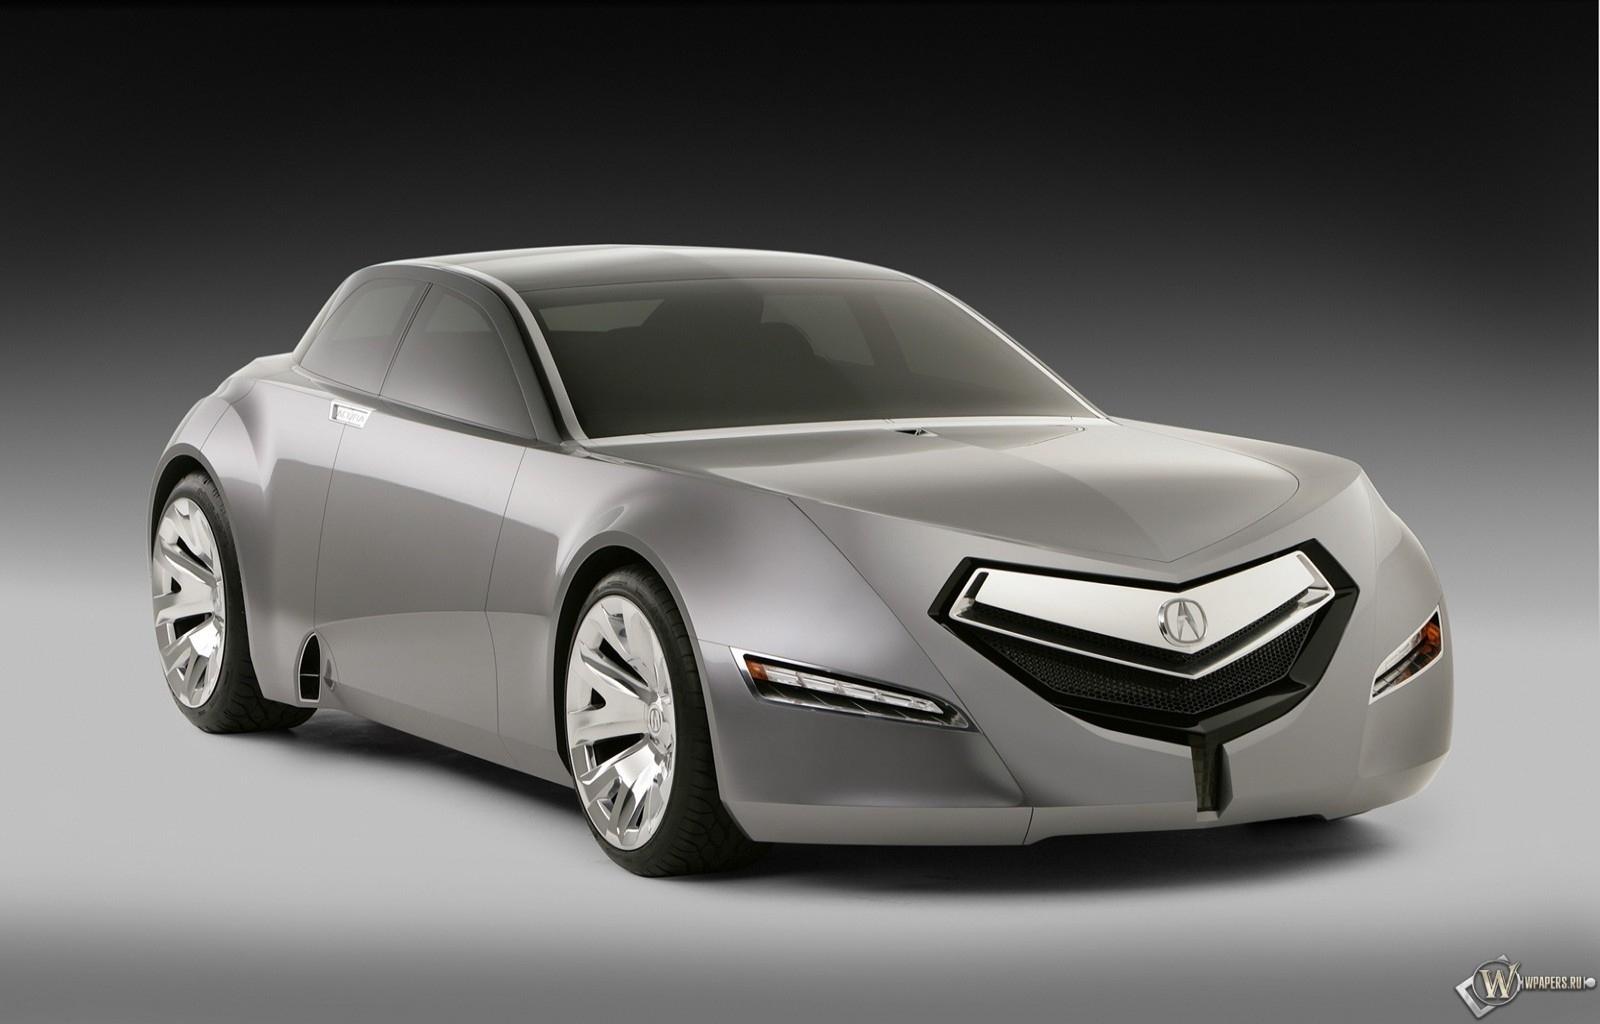 Acura Advanced Sedan Concept (2006) 1600x1024